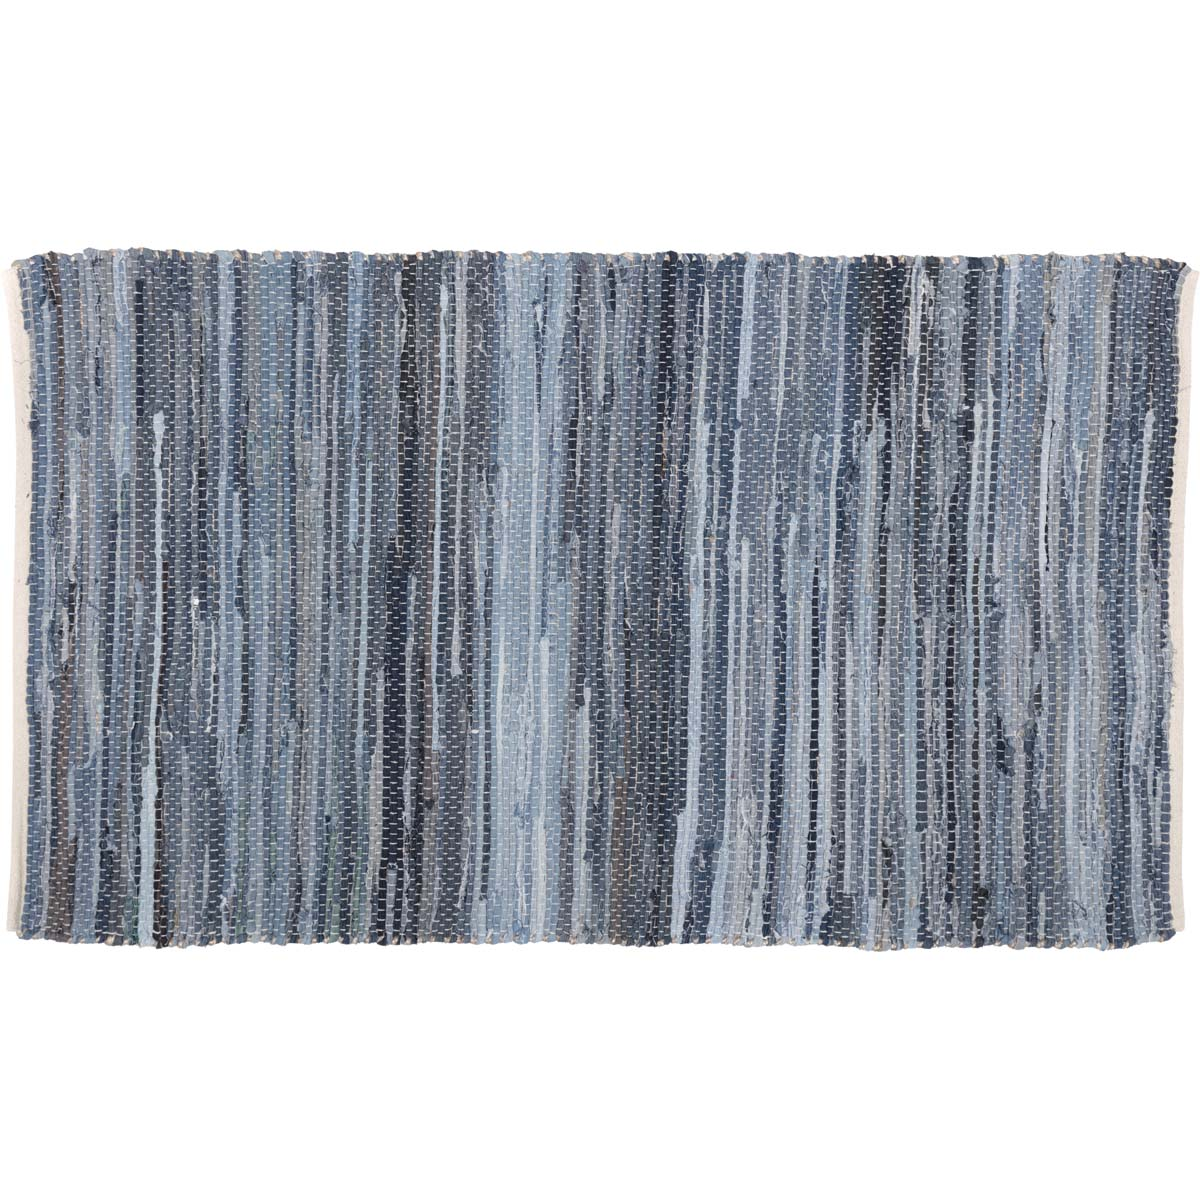 Denim Chindi Rag Rug: Blue Farmhouse Flooring VHC Denim & Hemp Rug Cotton Denim